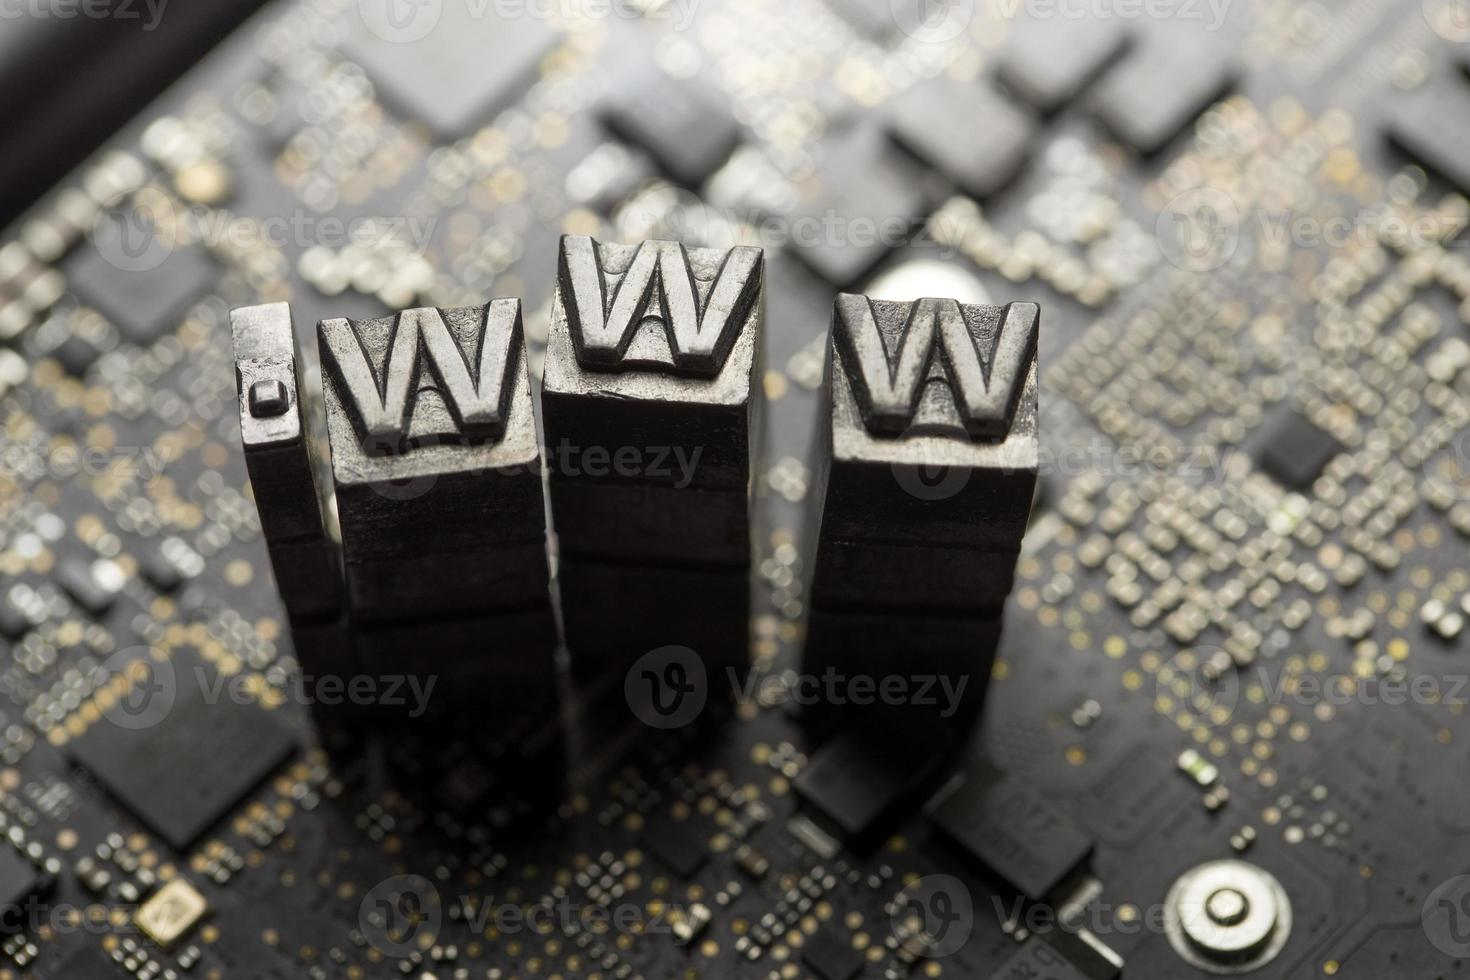 Internet www. website design & .com icon photo